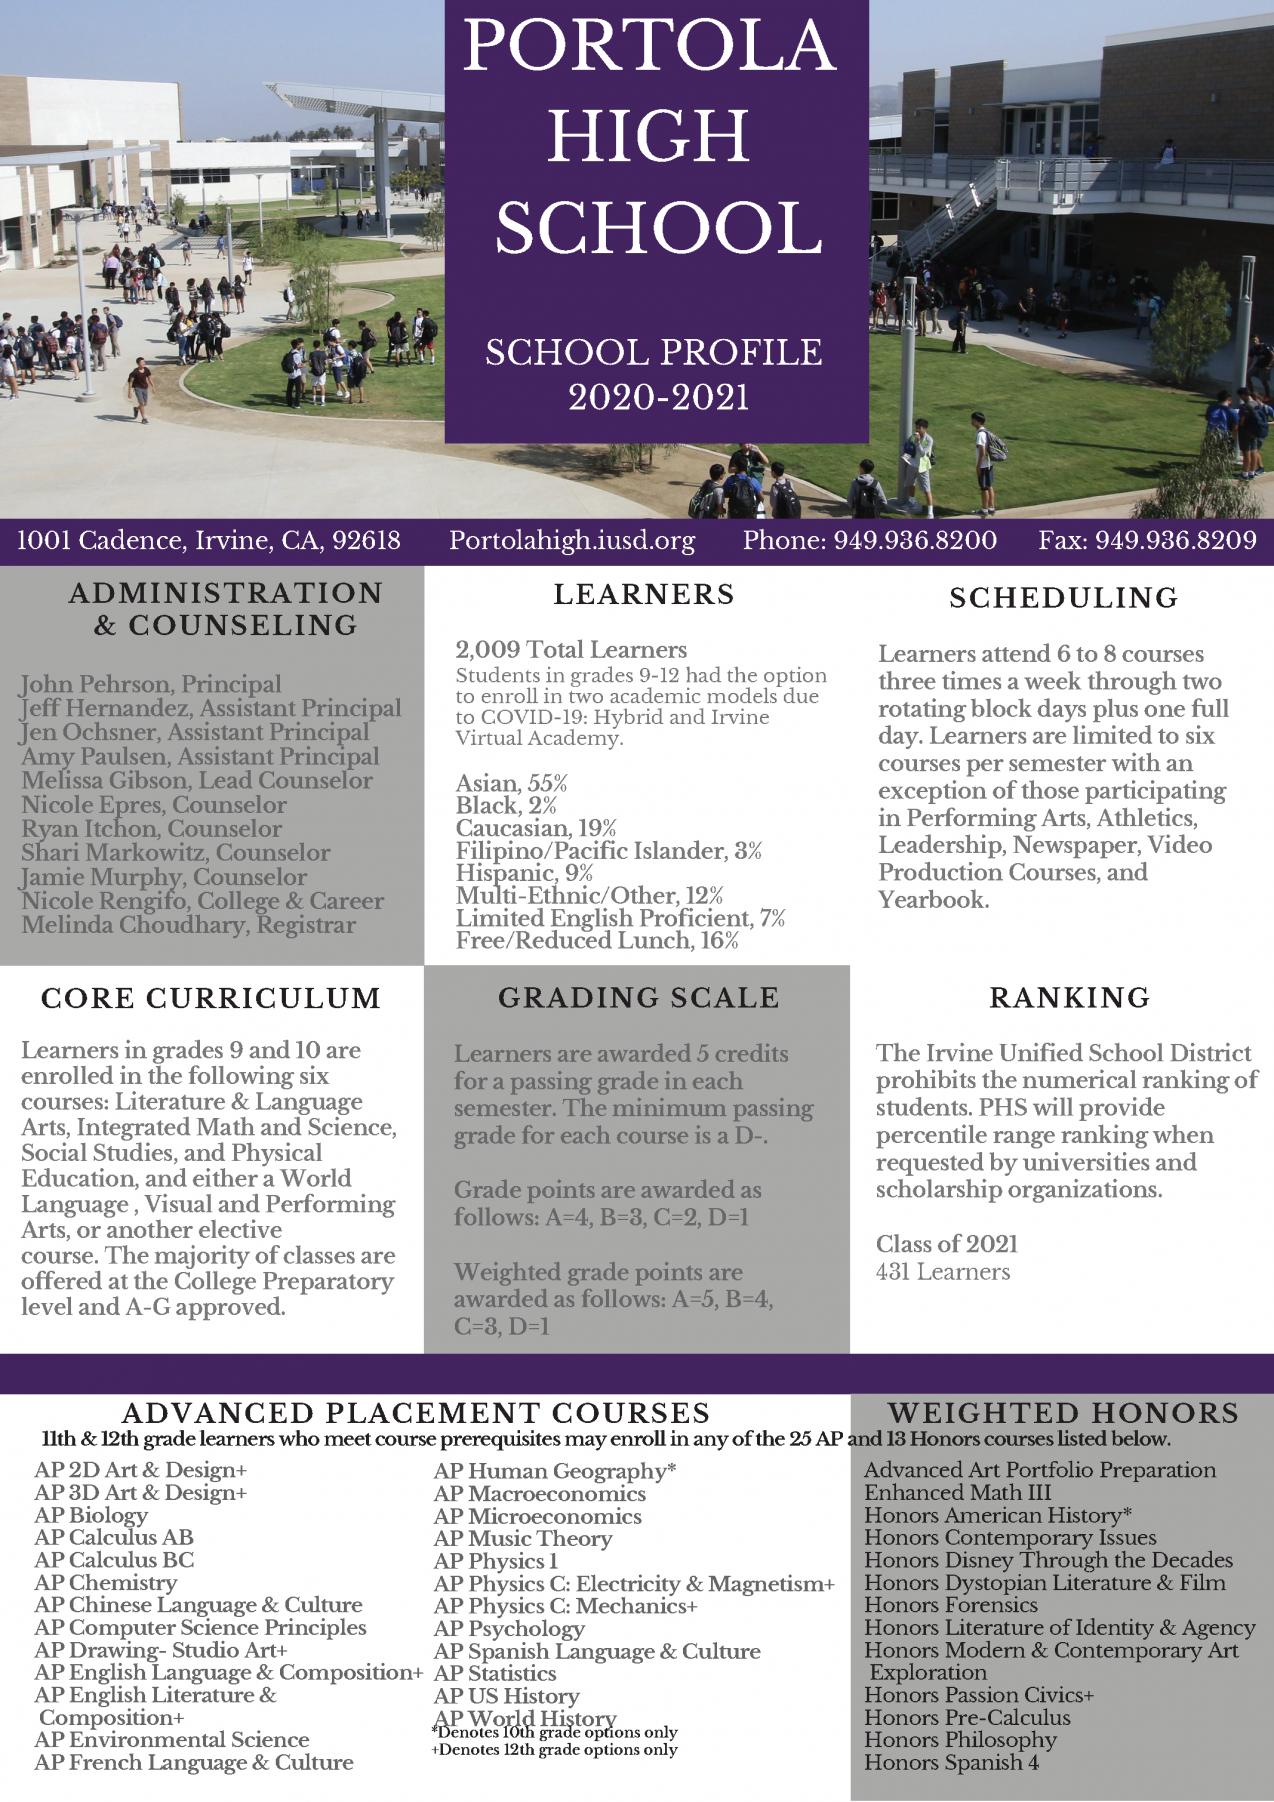 School profile 1